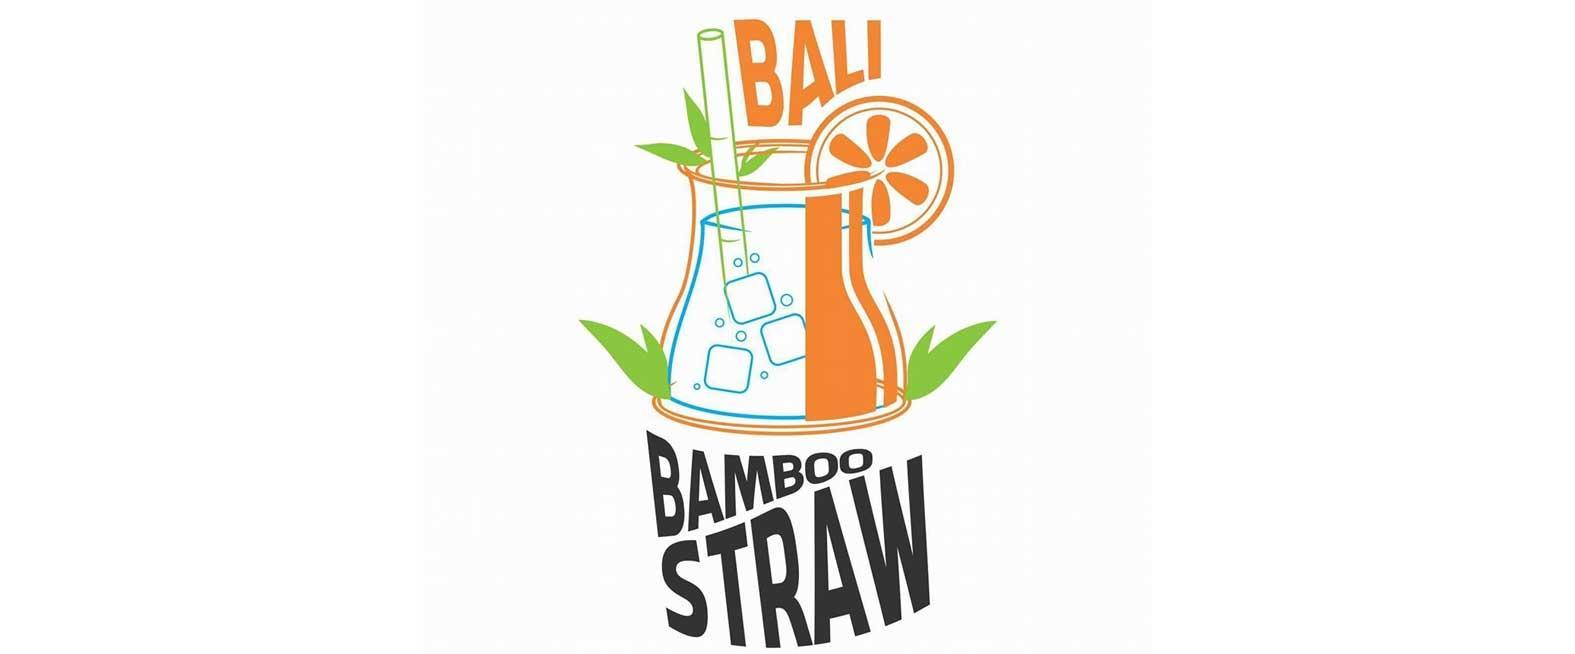 BALI BAMBOO STRAW